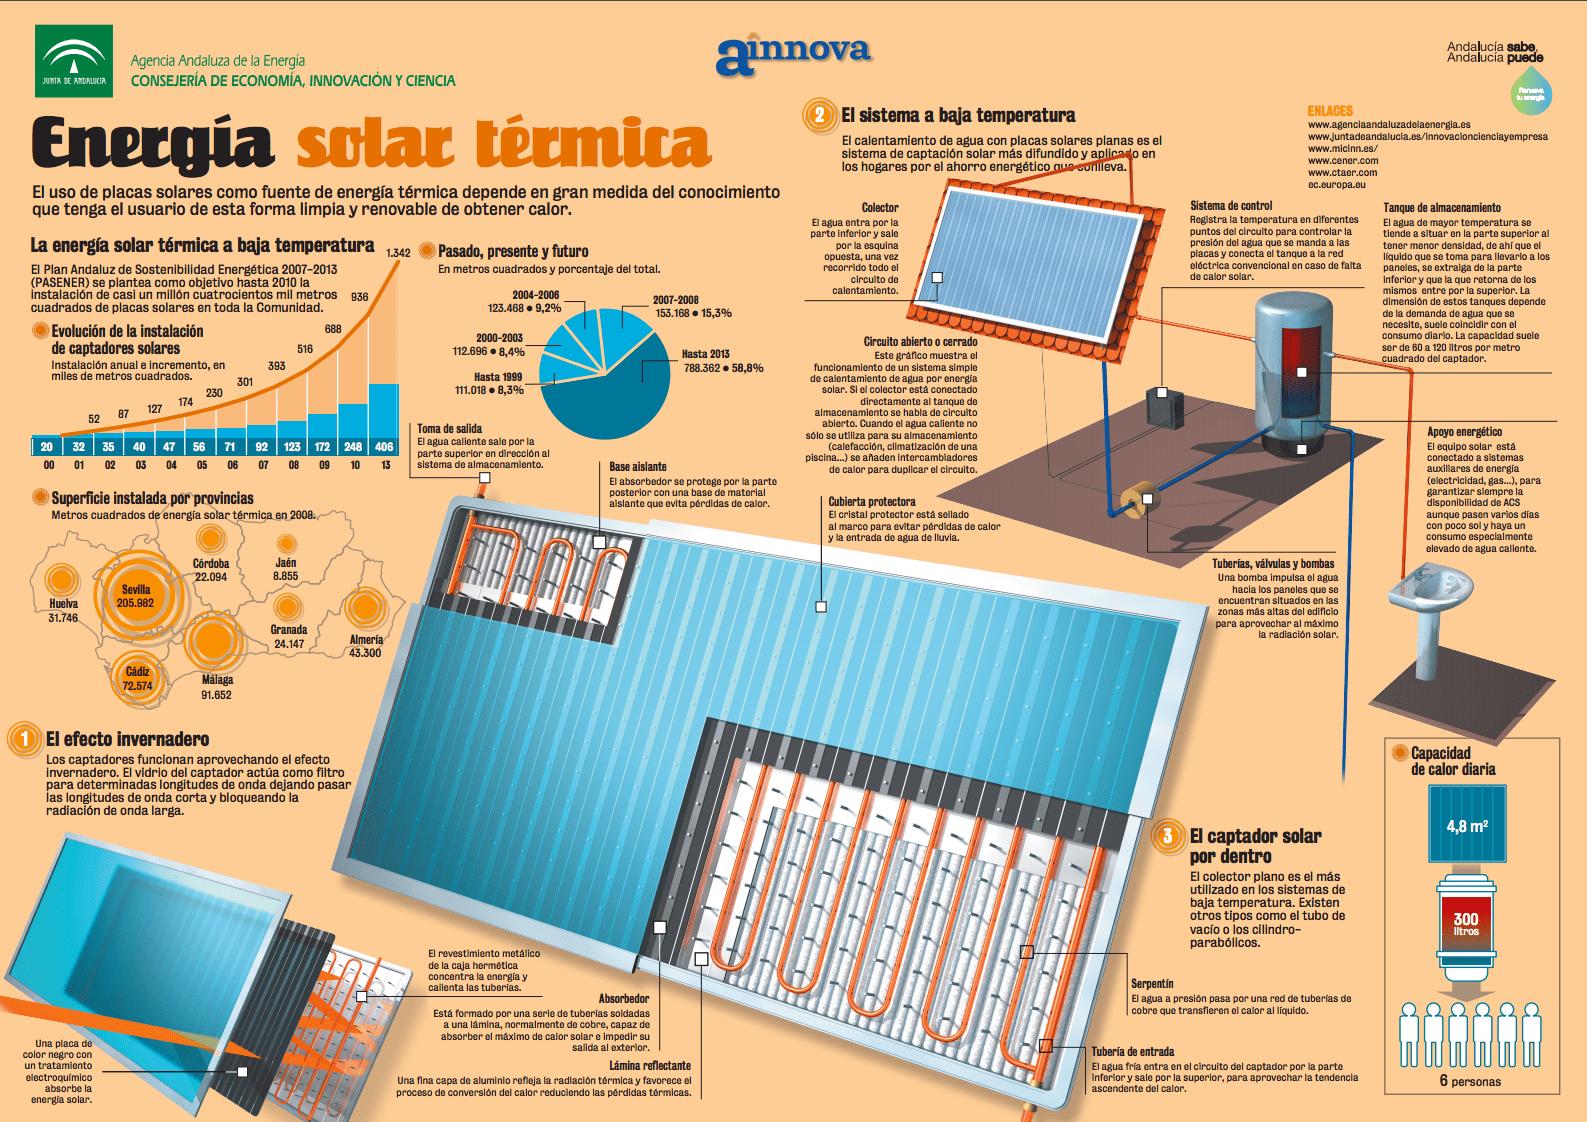 Energia Termosolar En Israel Energia Solar Termica Energia Solar Energia Renovable